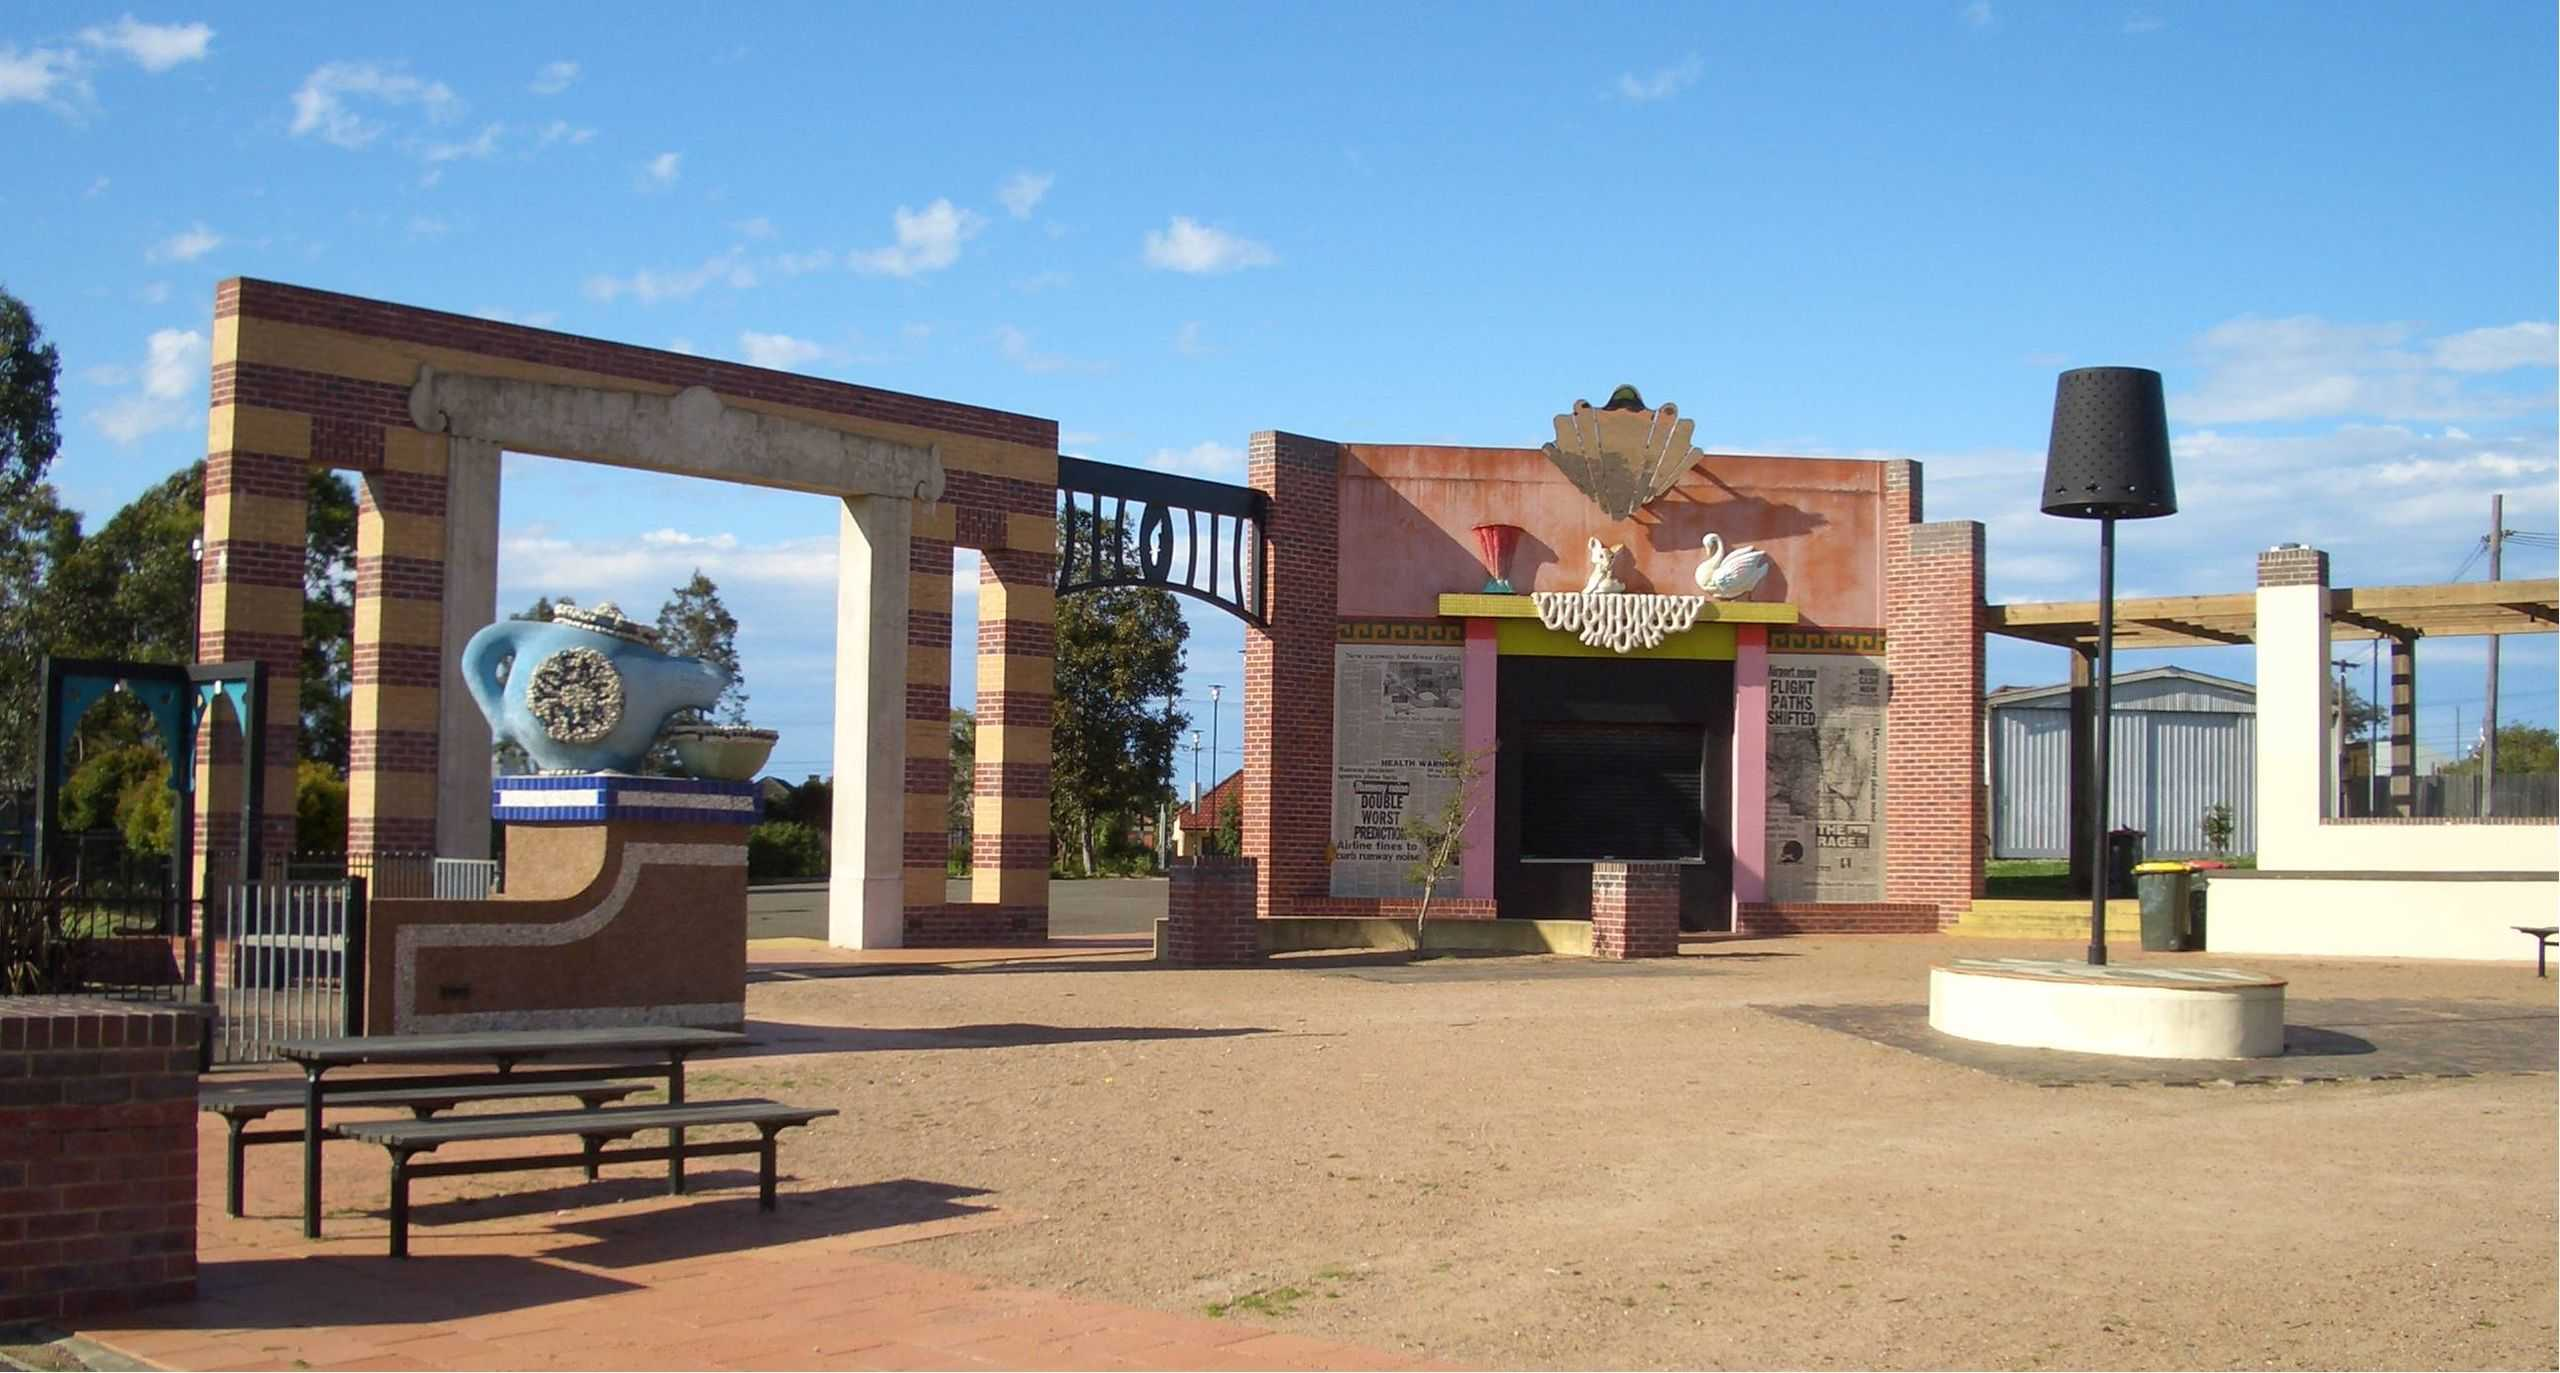 Sydenham nsw